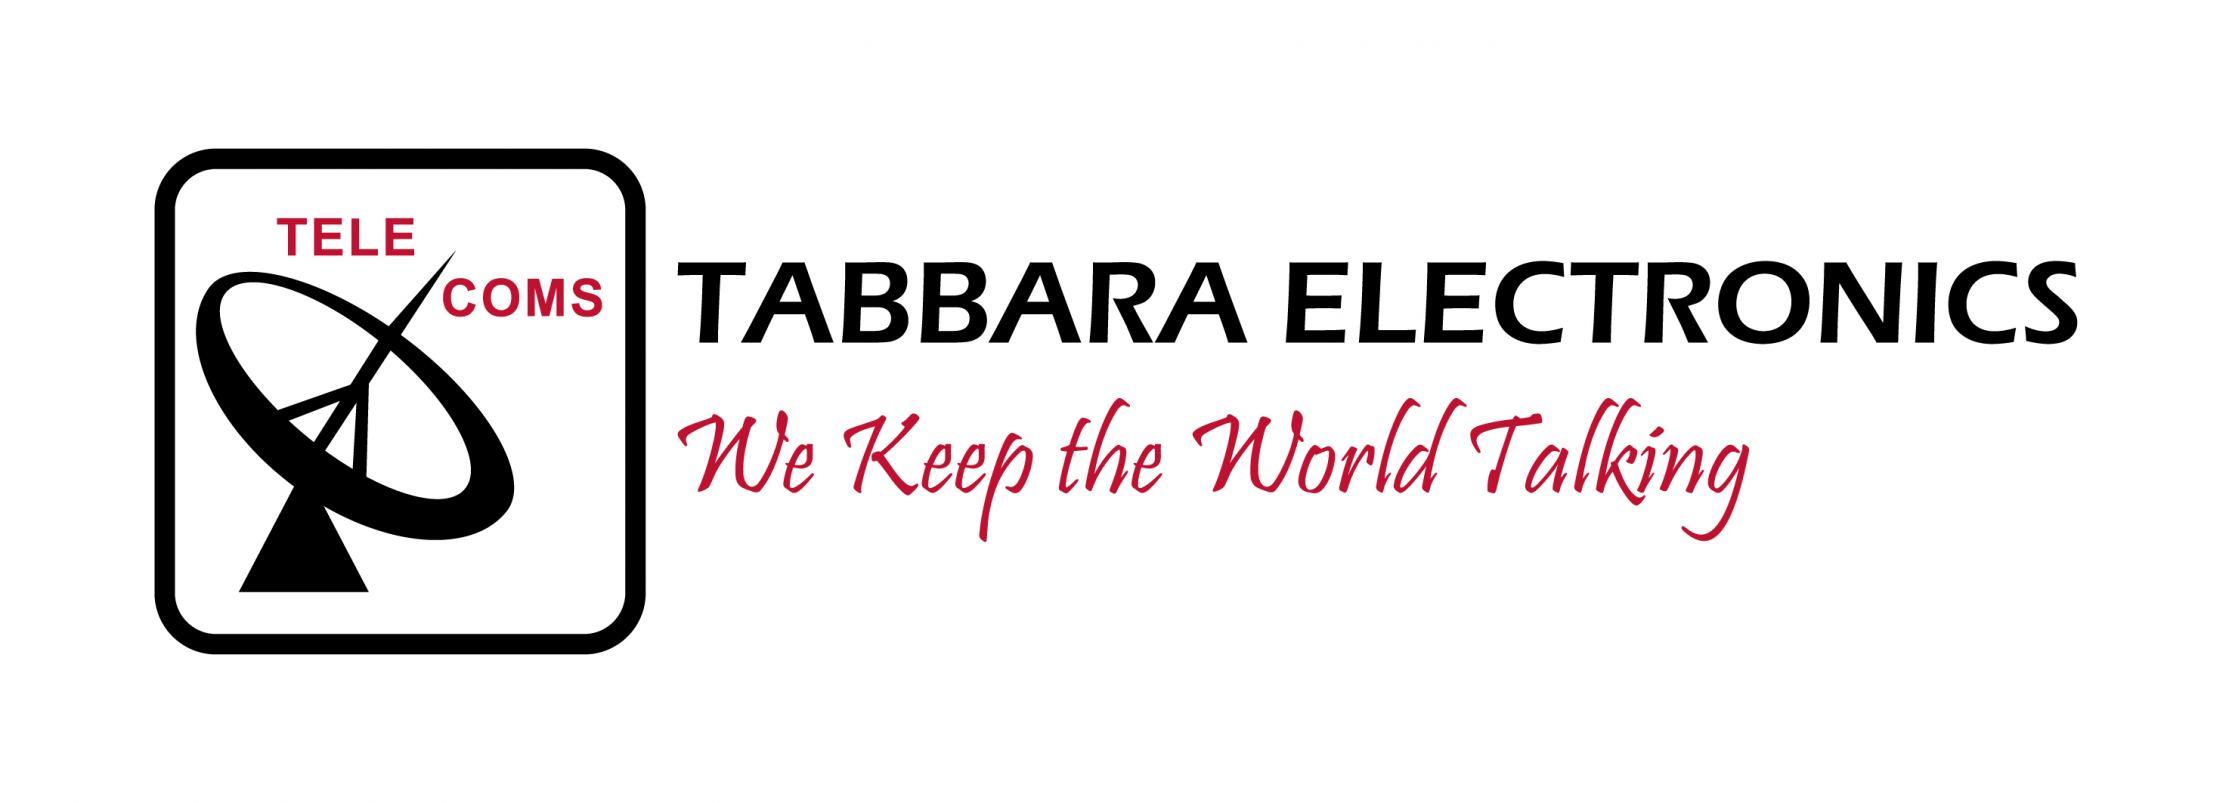 tabbaraelectronics Logo